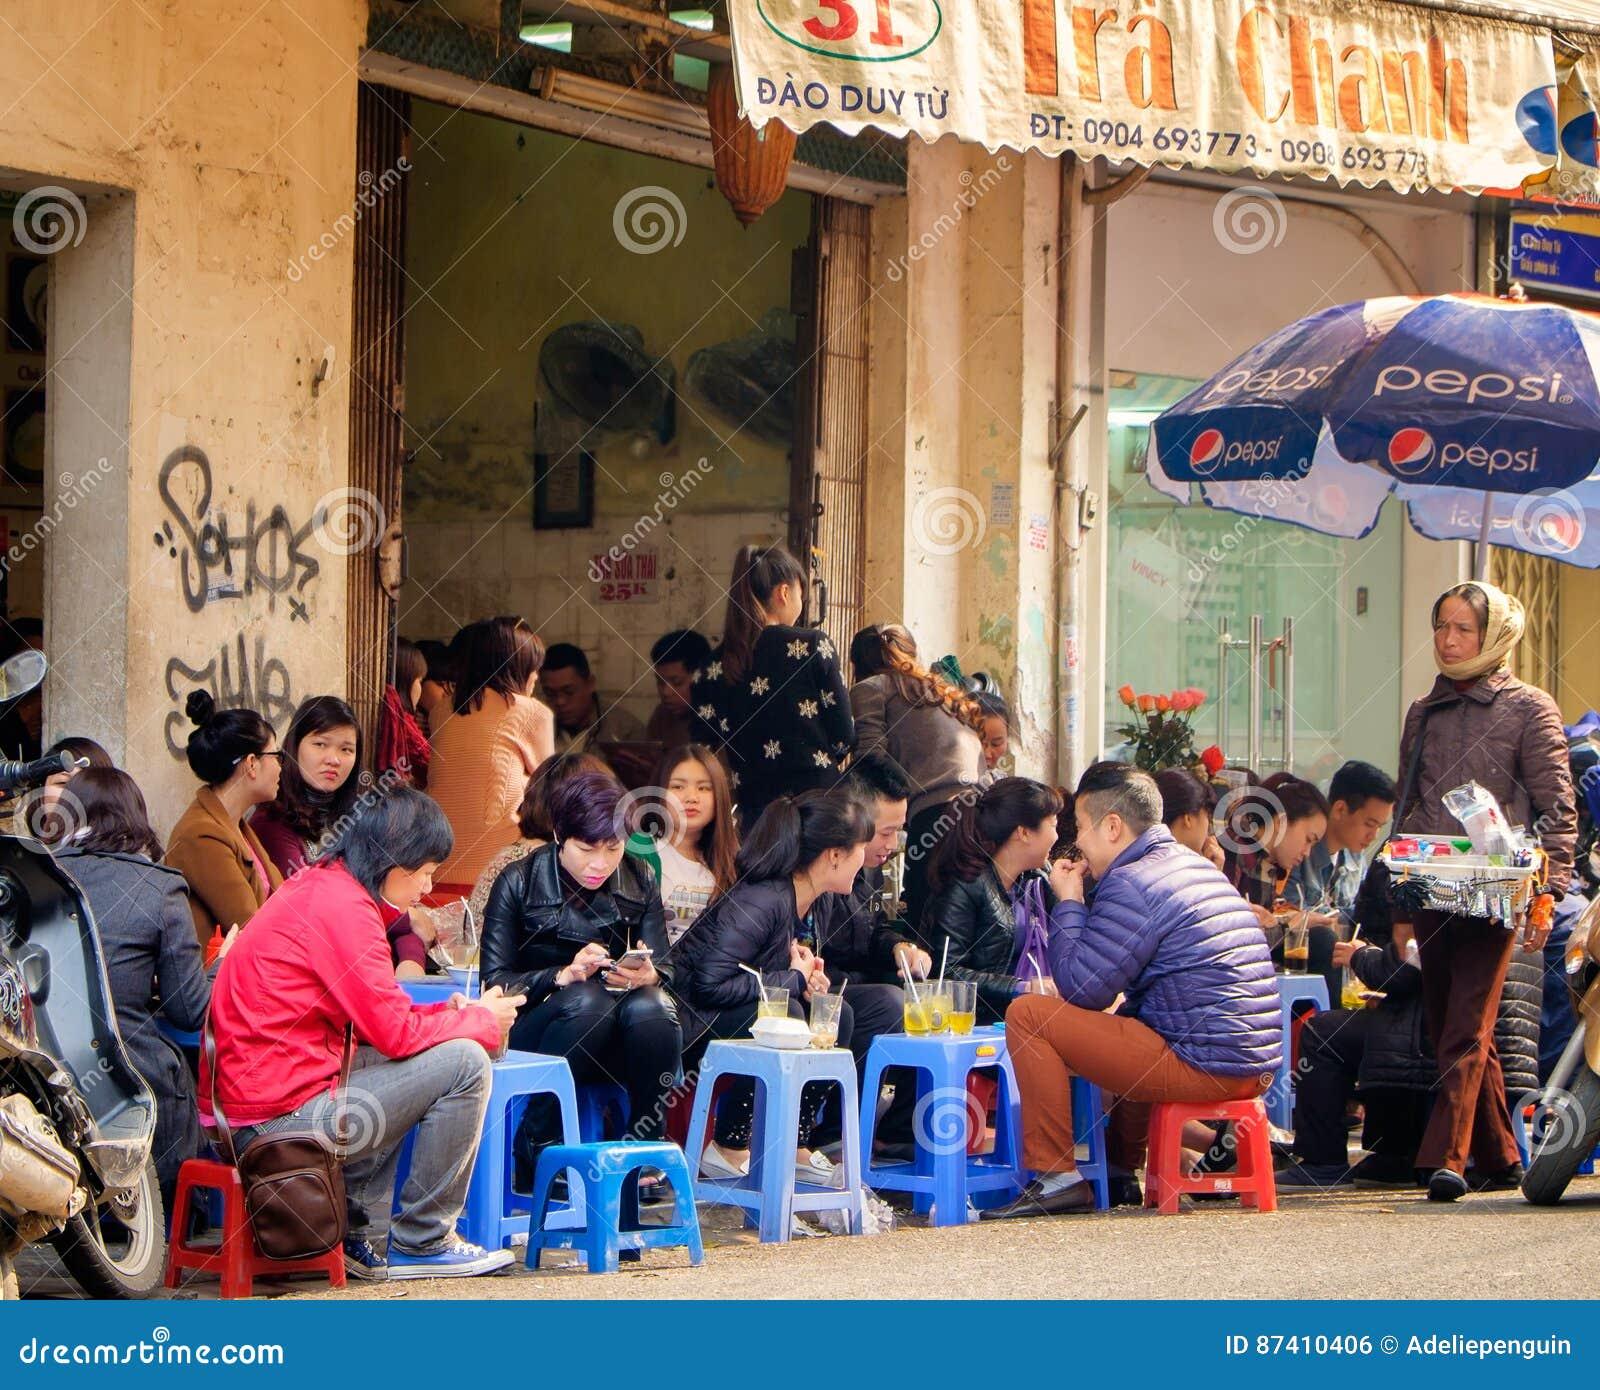 Crowded Hanoi Cafe, Vietnam